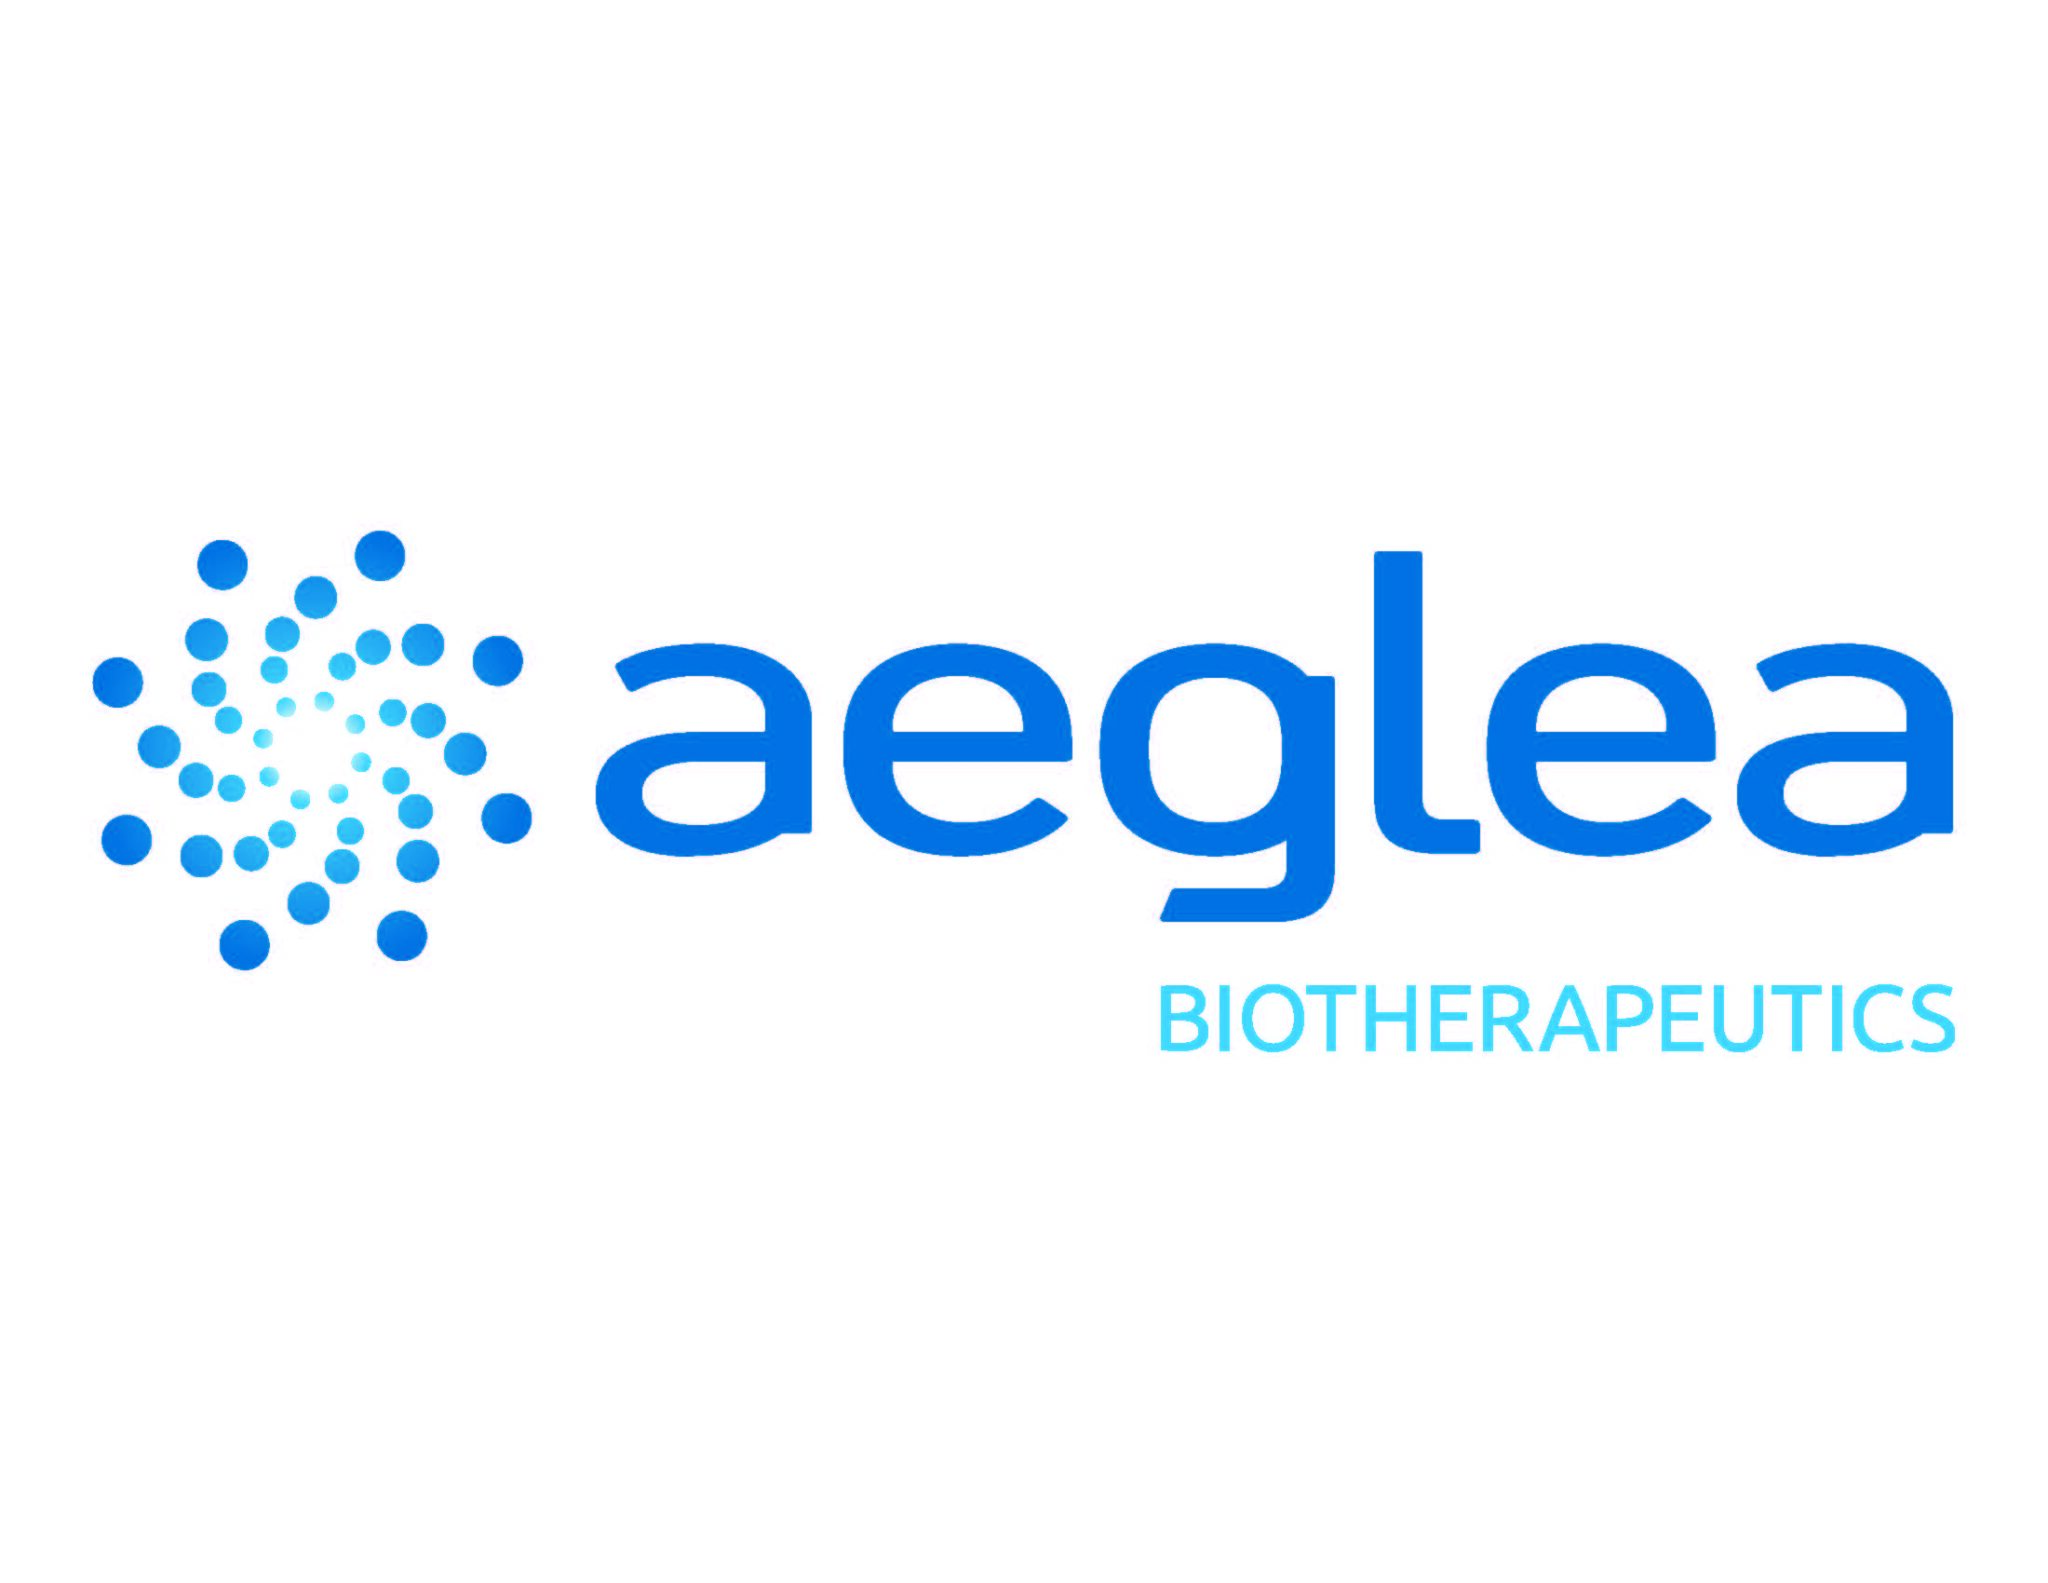 Aeglea Presents at ASHG on ACN00177